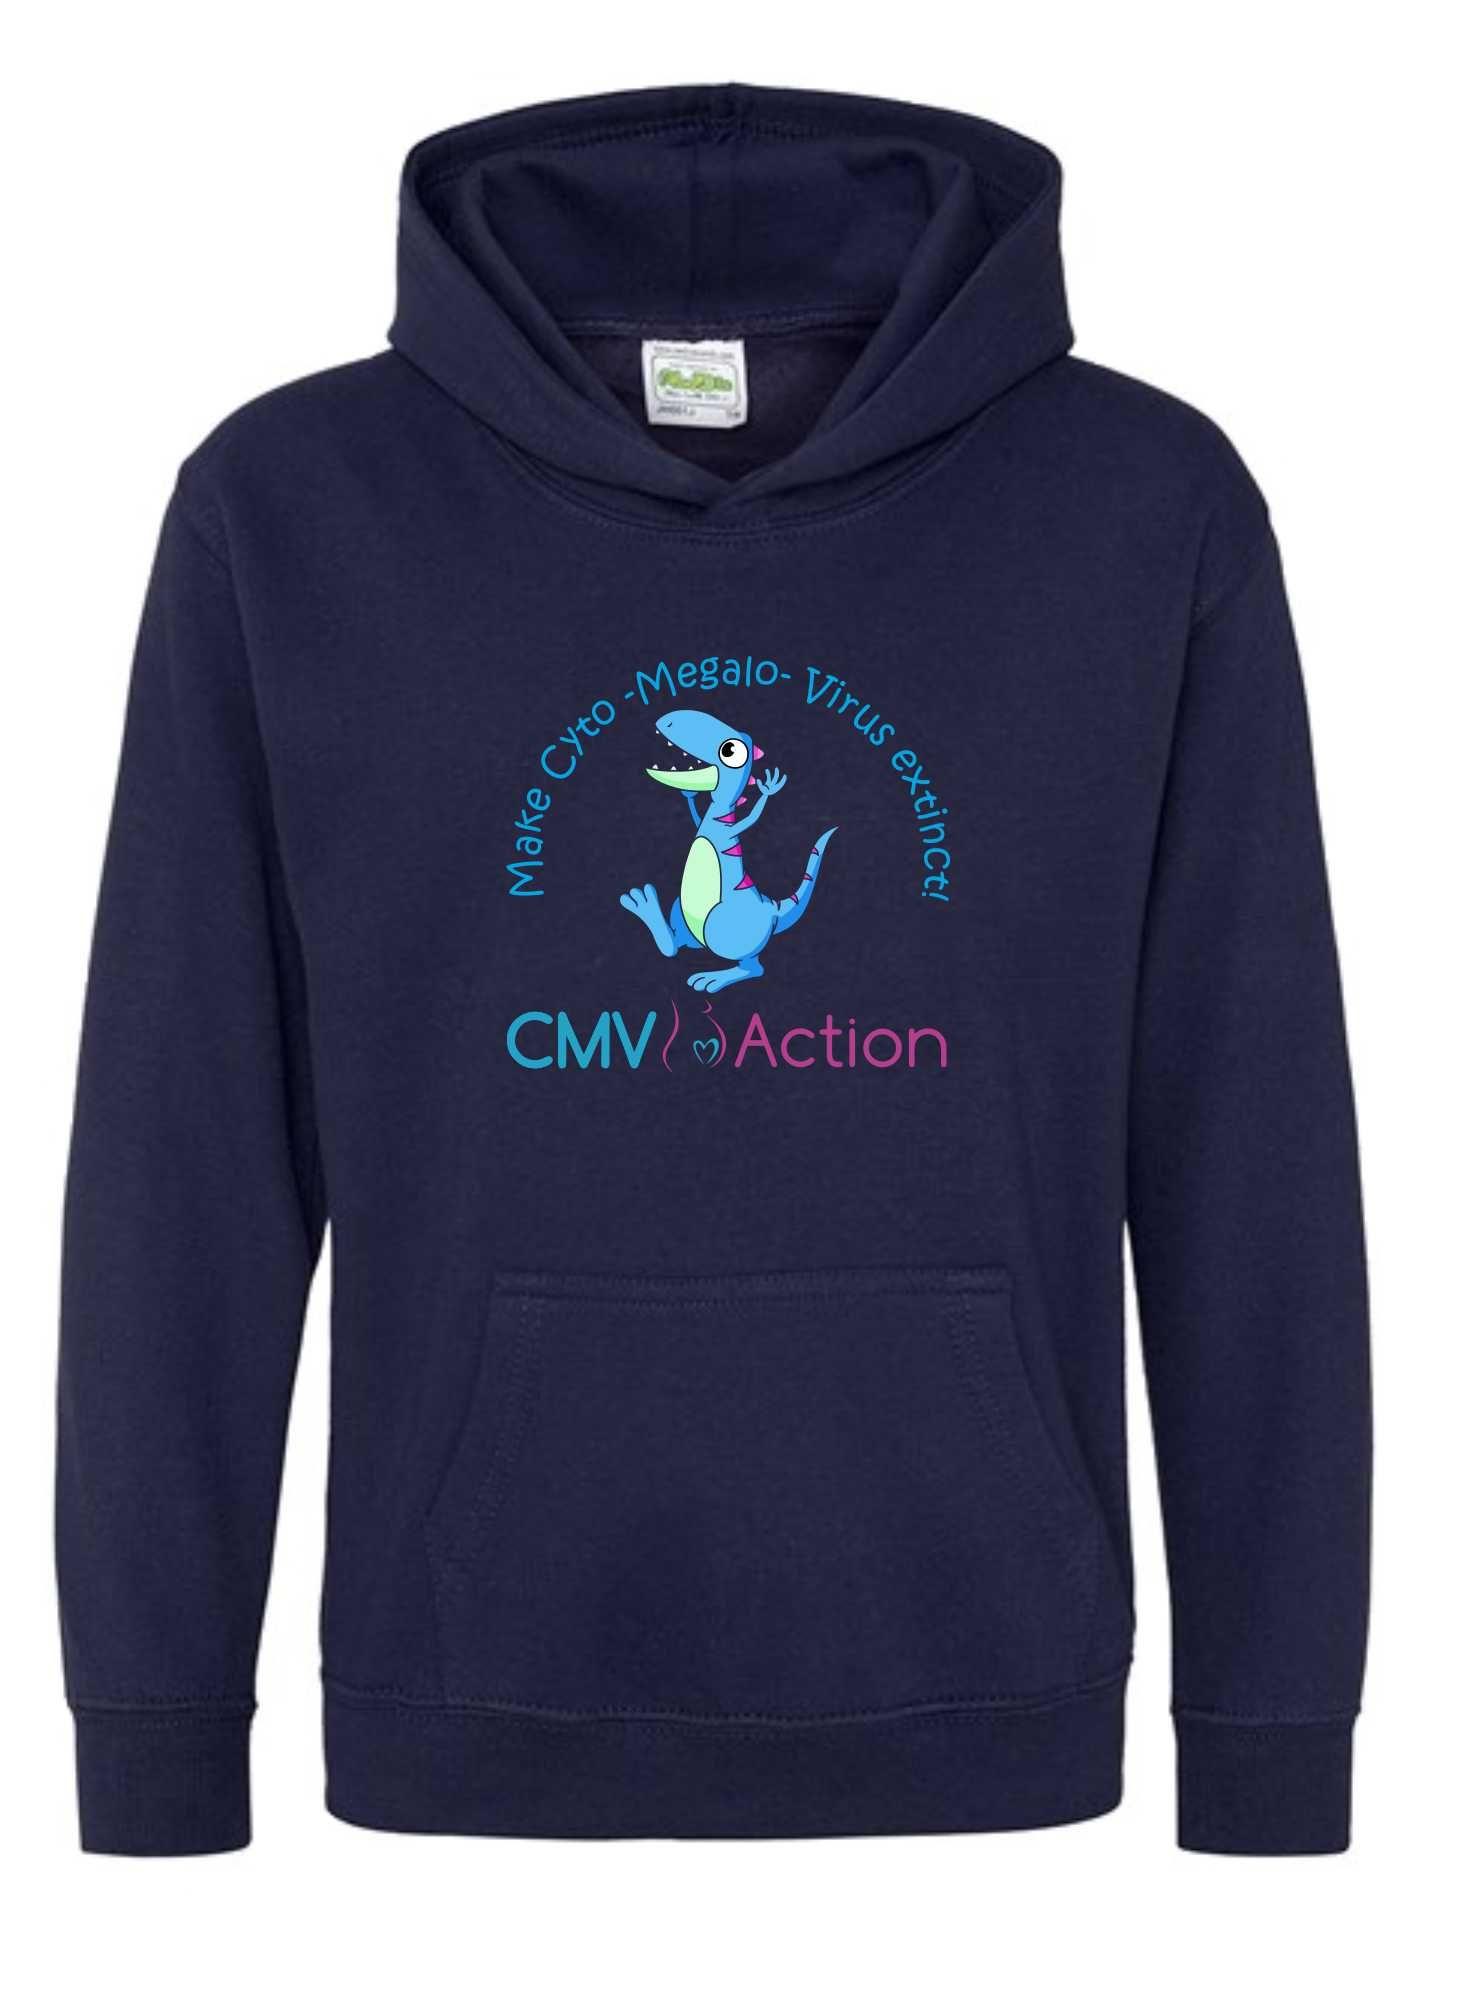 CMV- Blue Dinosaur Hoodie (Oxford Navy) (Kids)